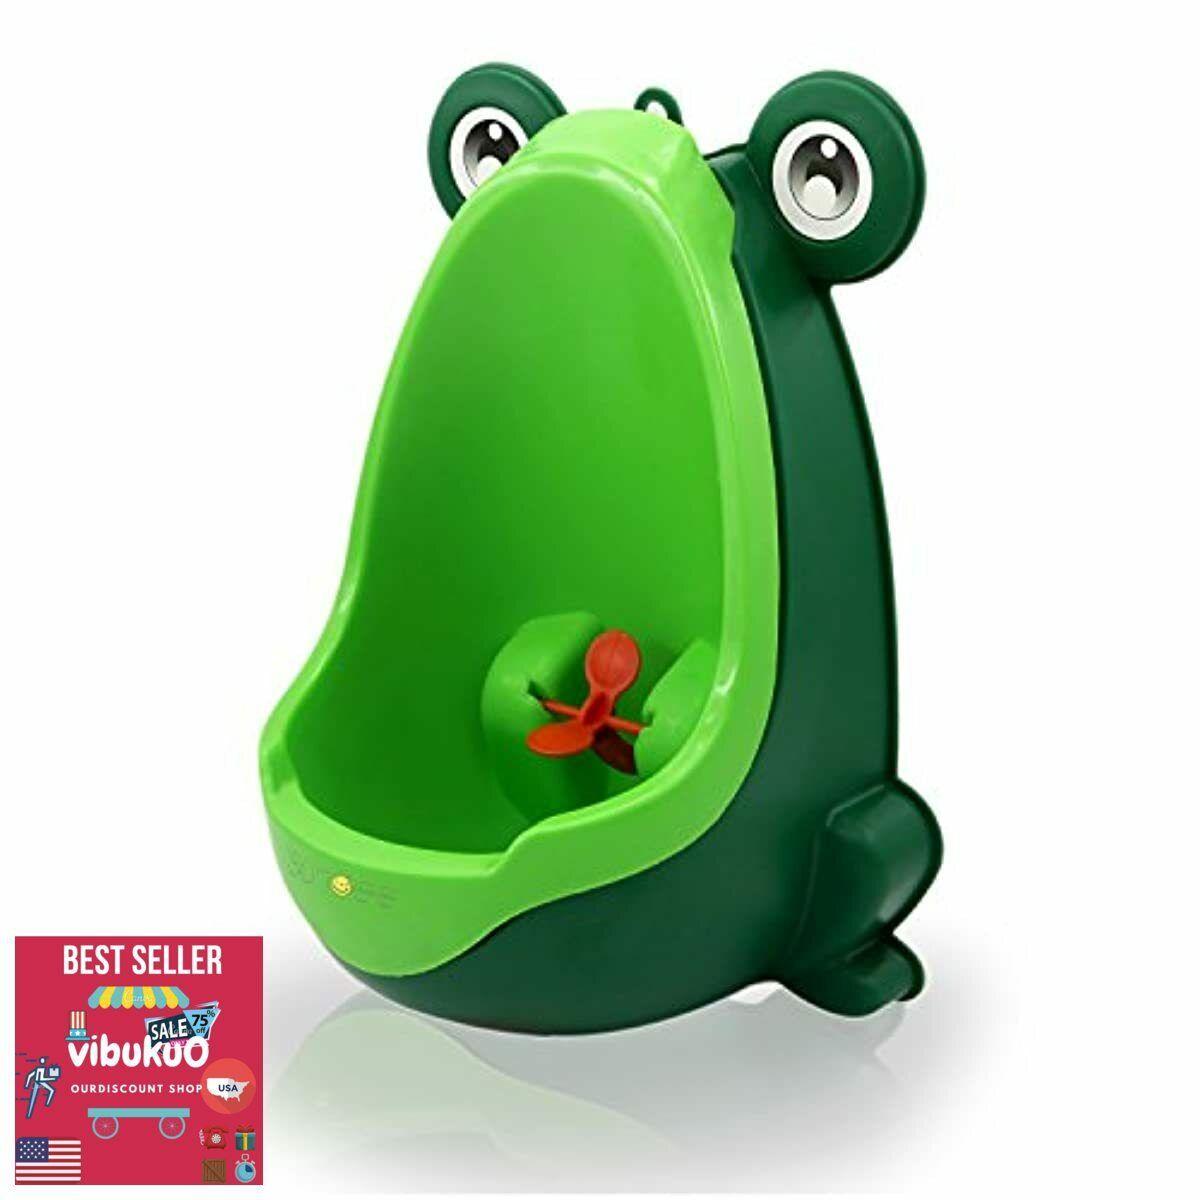 Frog Children Potty Training Toilette Urinal Baby Toddler Fu